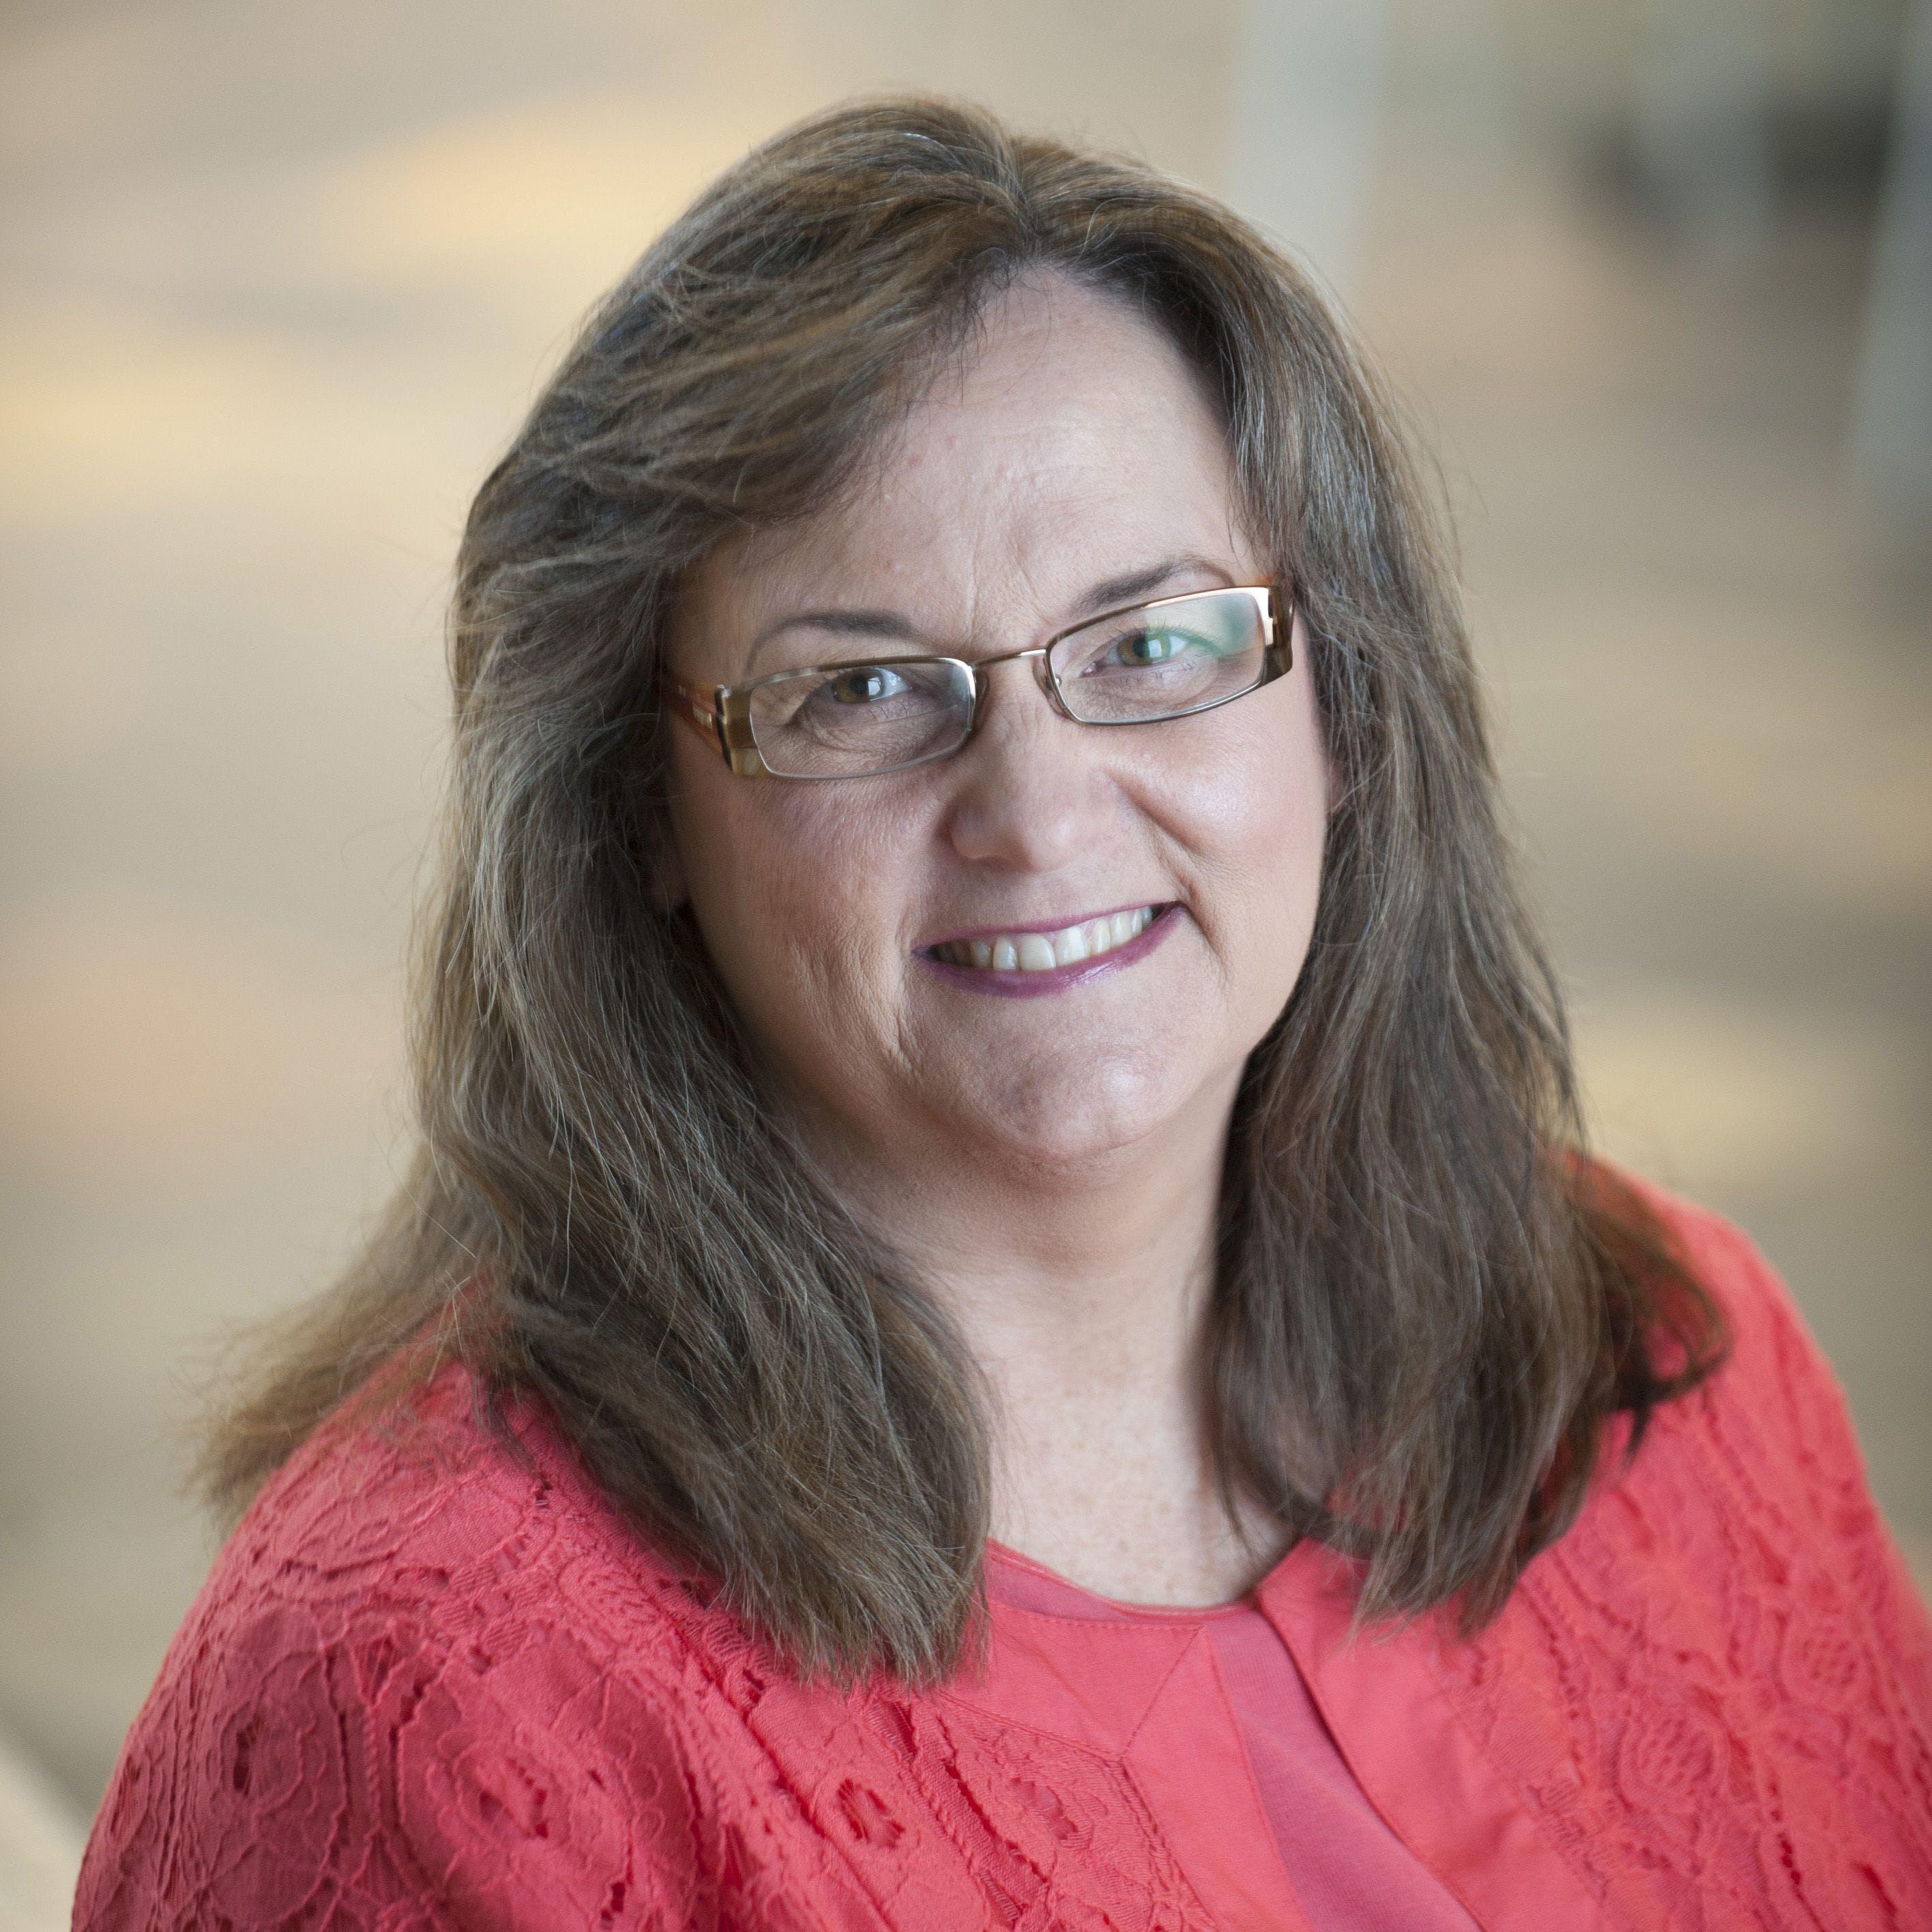 Joyce LeMay